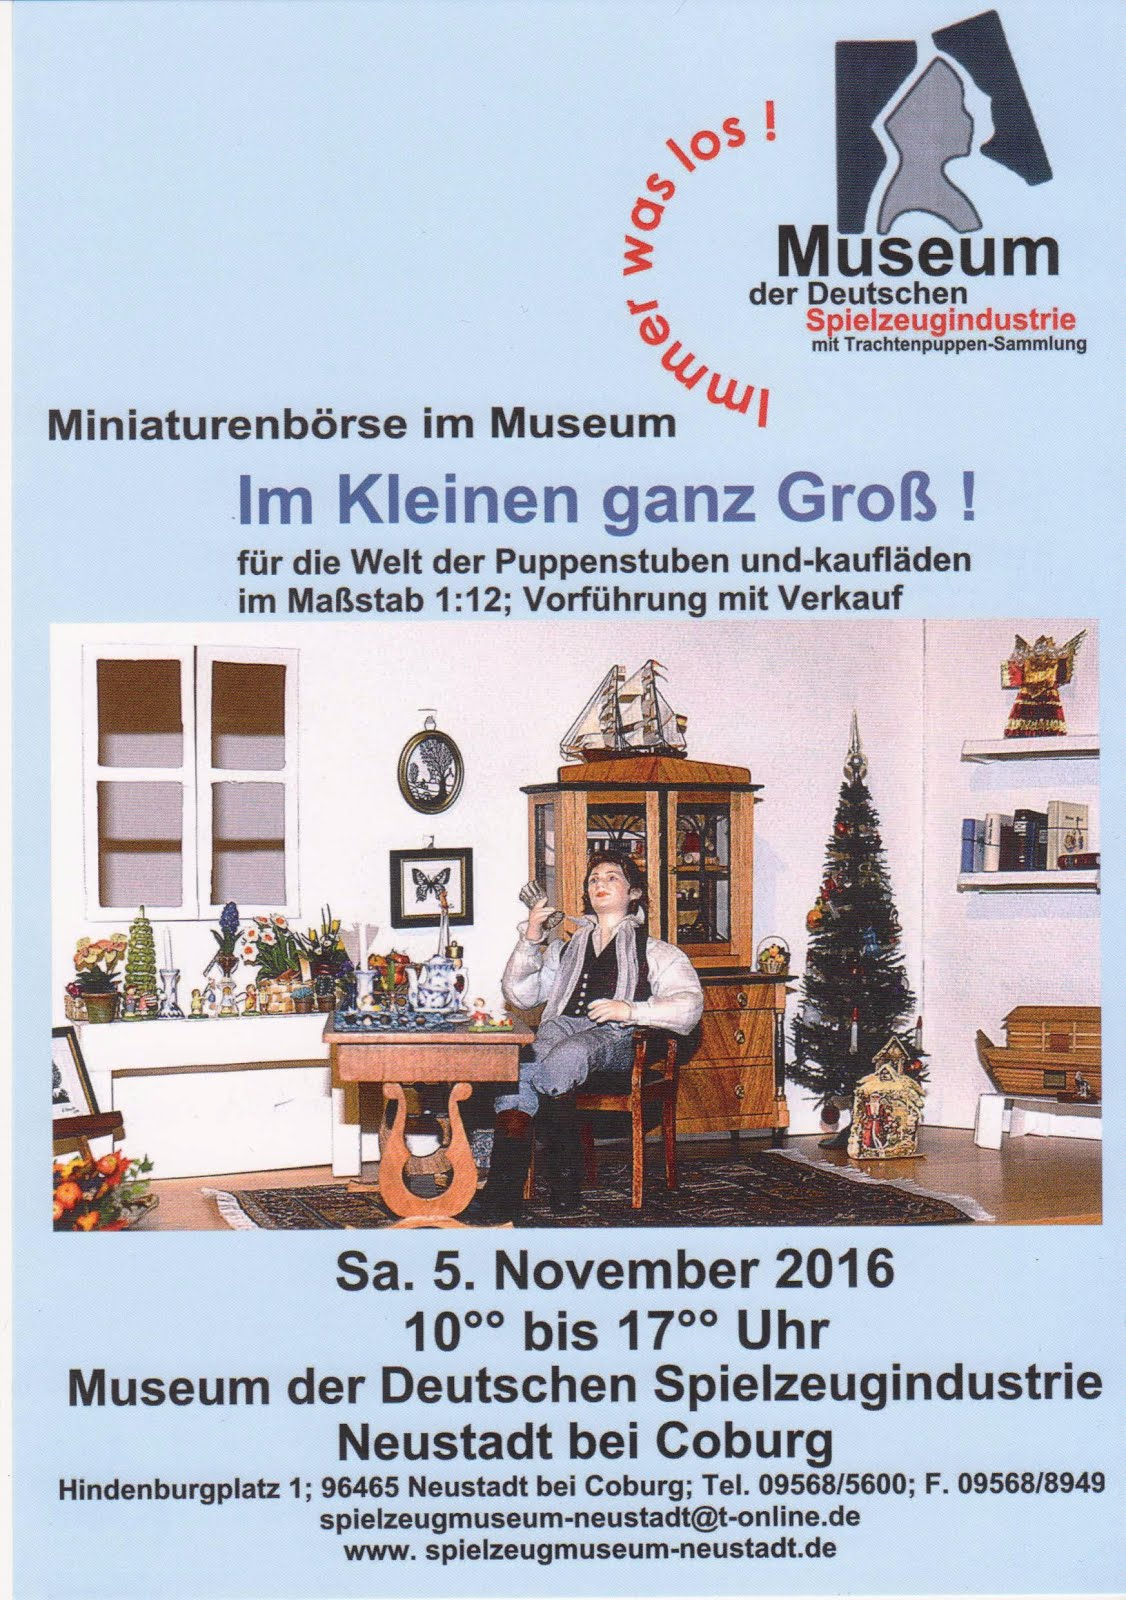 14. Miniaturenbörse, Neustadt bei Coburg